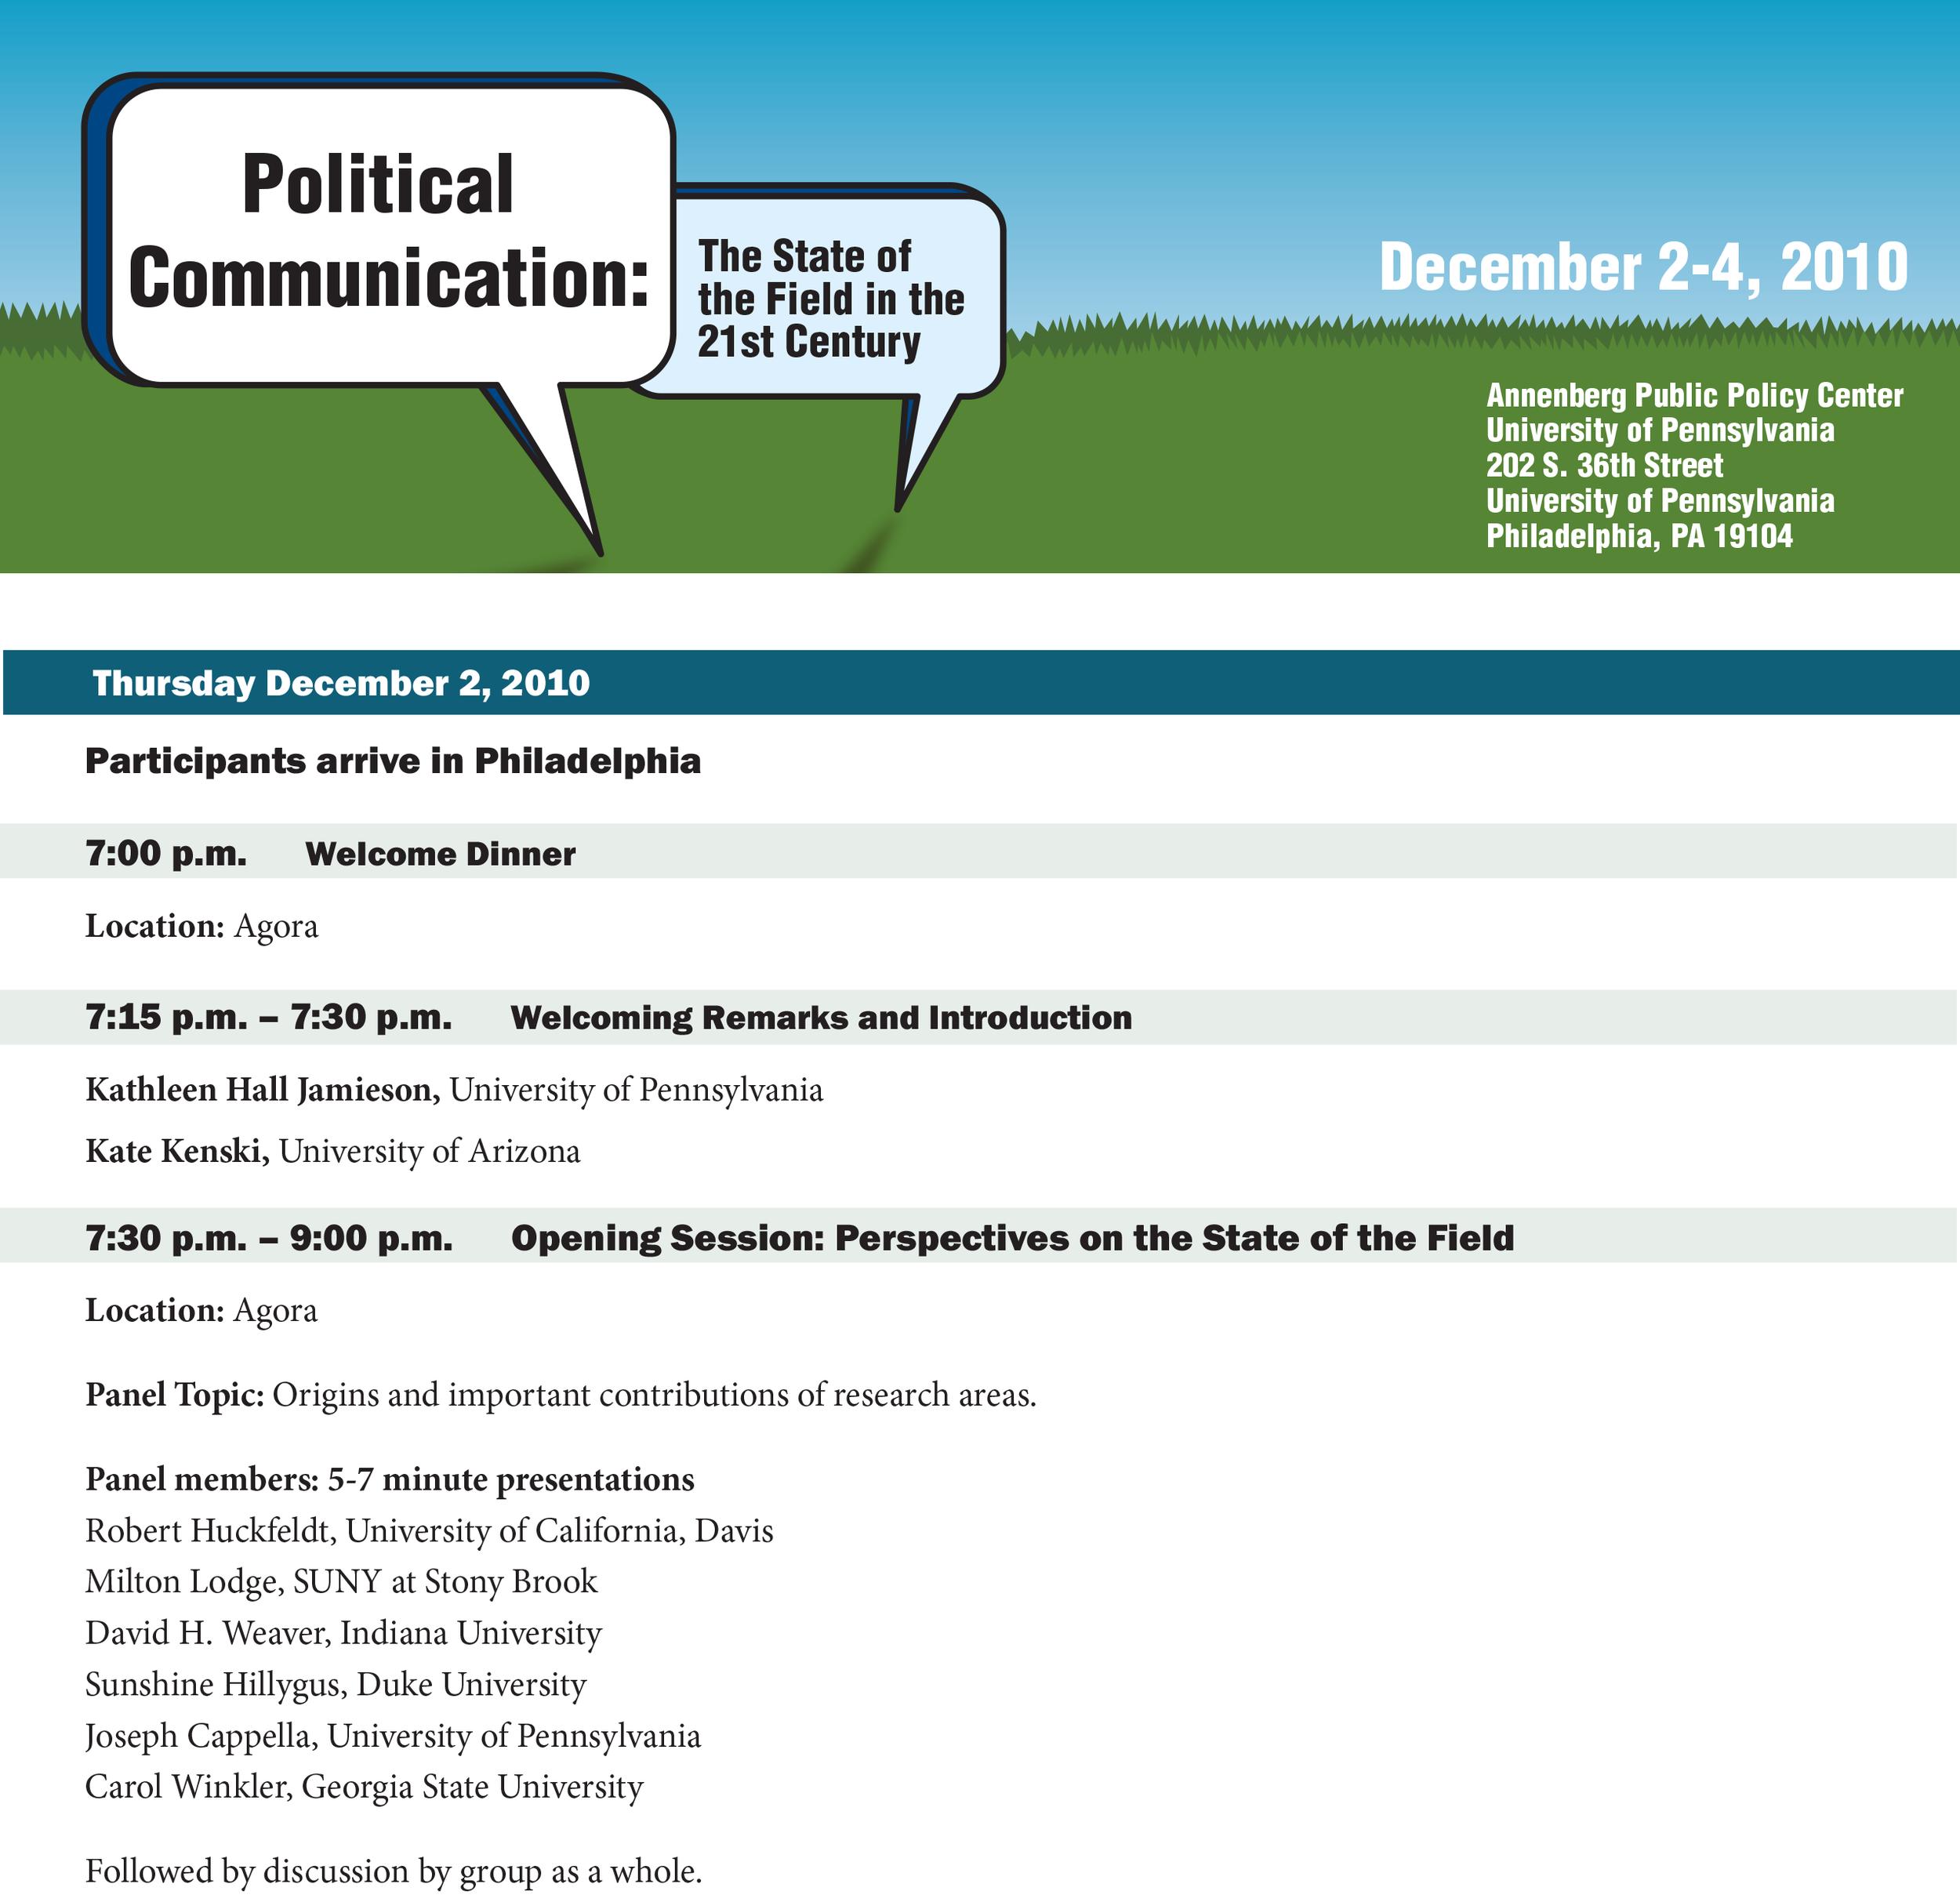 Conference agenda, Annenberg Public Policy Center, University of Pennsylvania